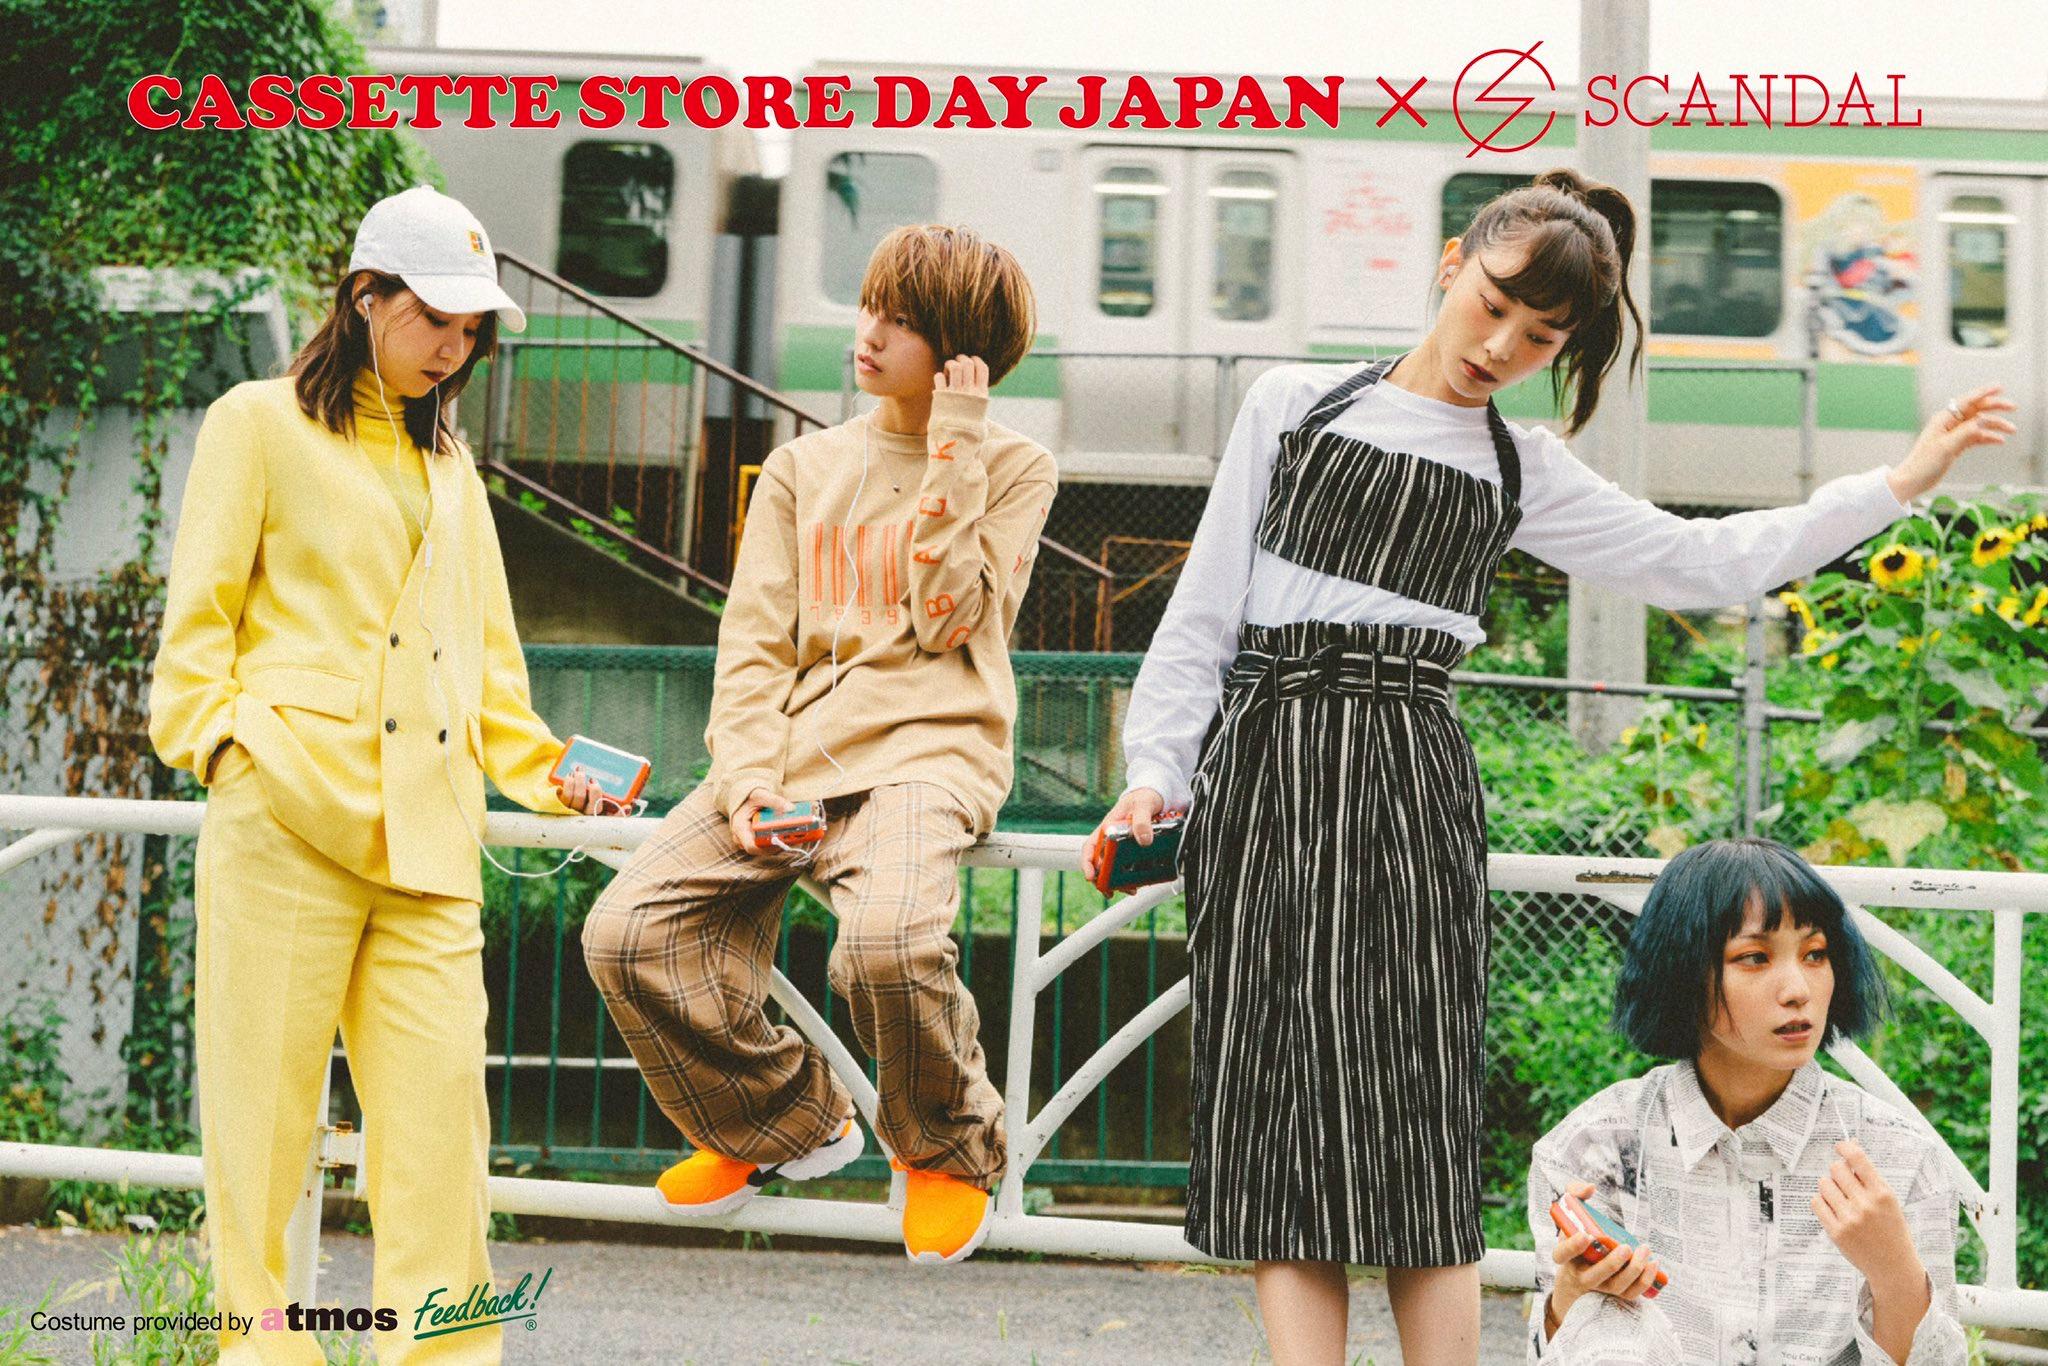 JRock247-SCANDAL-Cassette Store Day 1